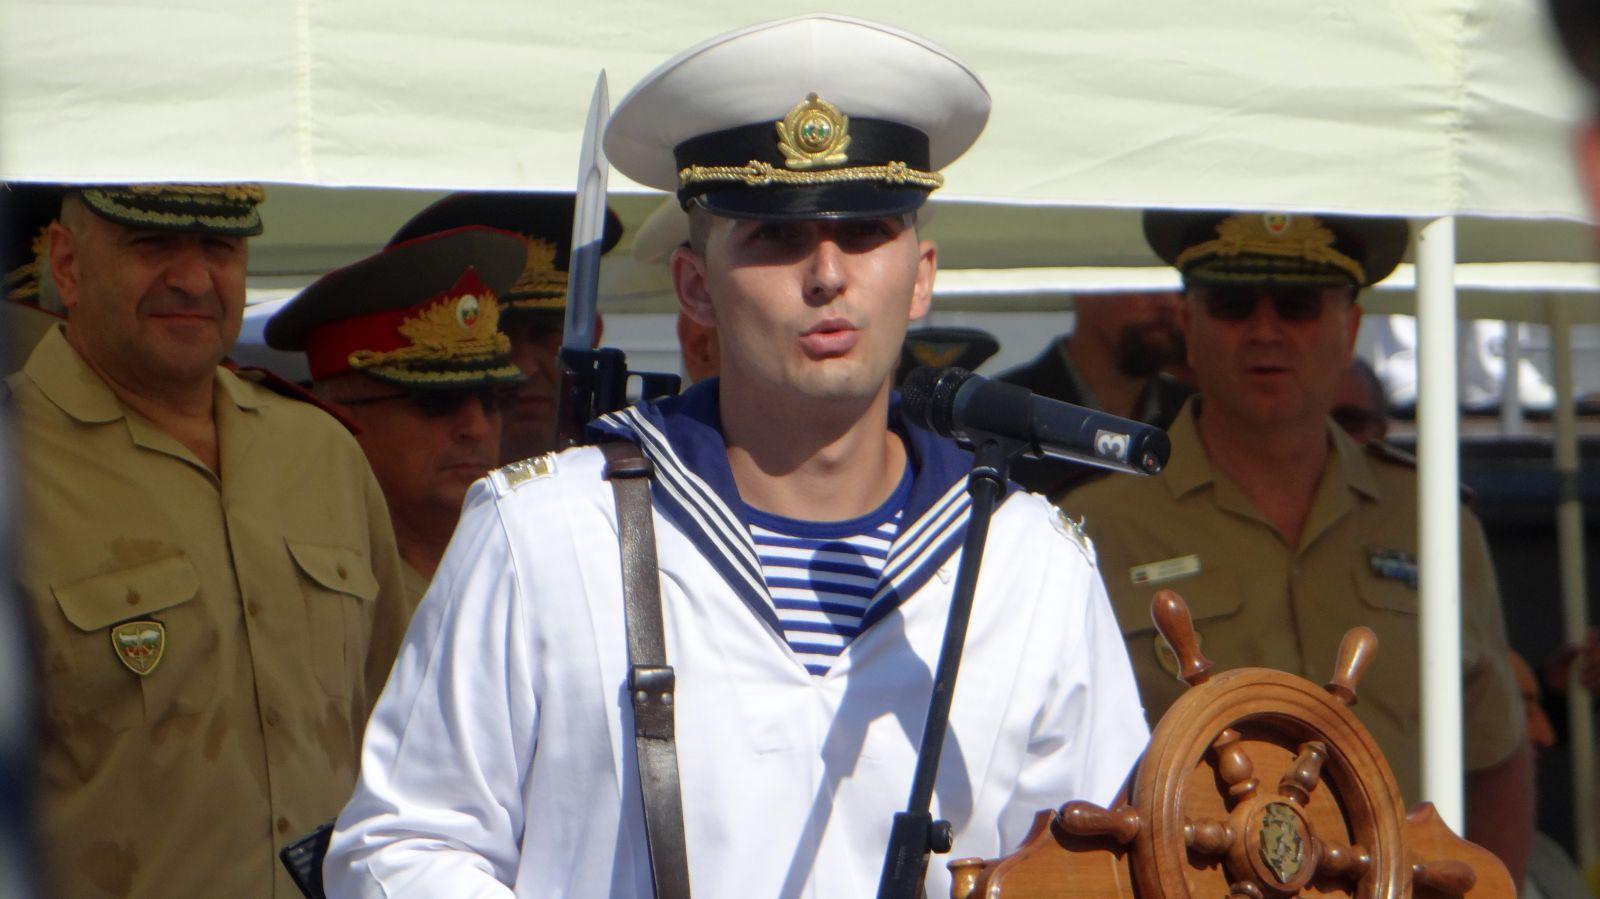 ХОРАТА И БЪЛГАРСКИТЕ ВМС: 40 ПРЕКРАСНИ СНИМКИ ЗА 140 ГОДИНИ ФЛОТ! ВИЖТЕ ТУК!